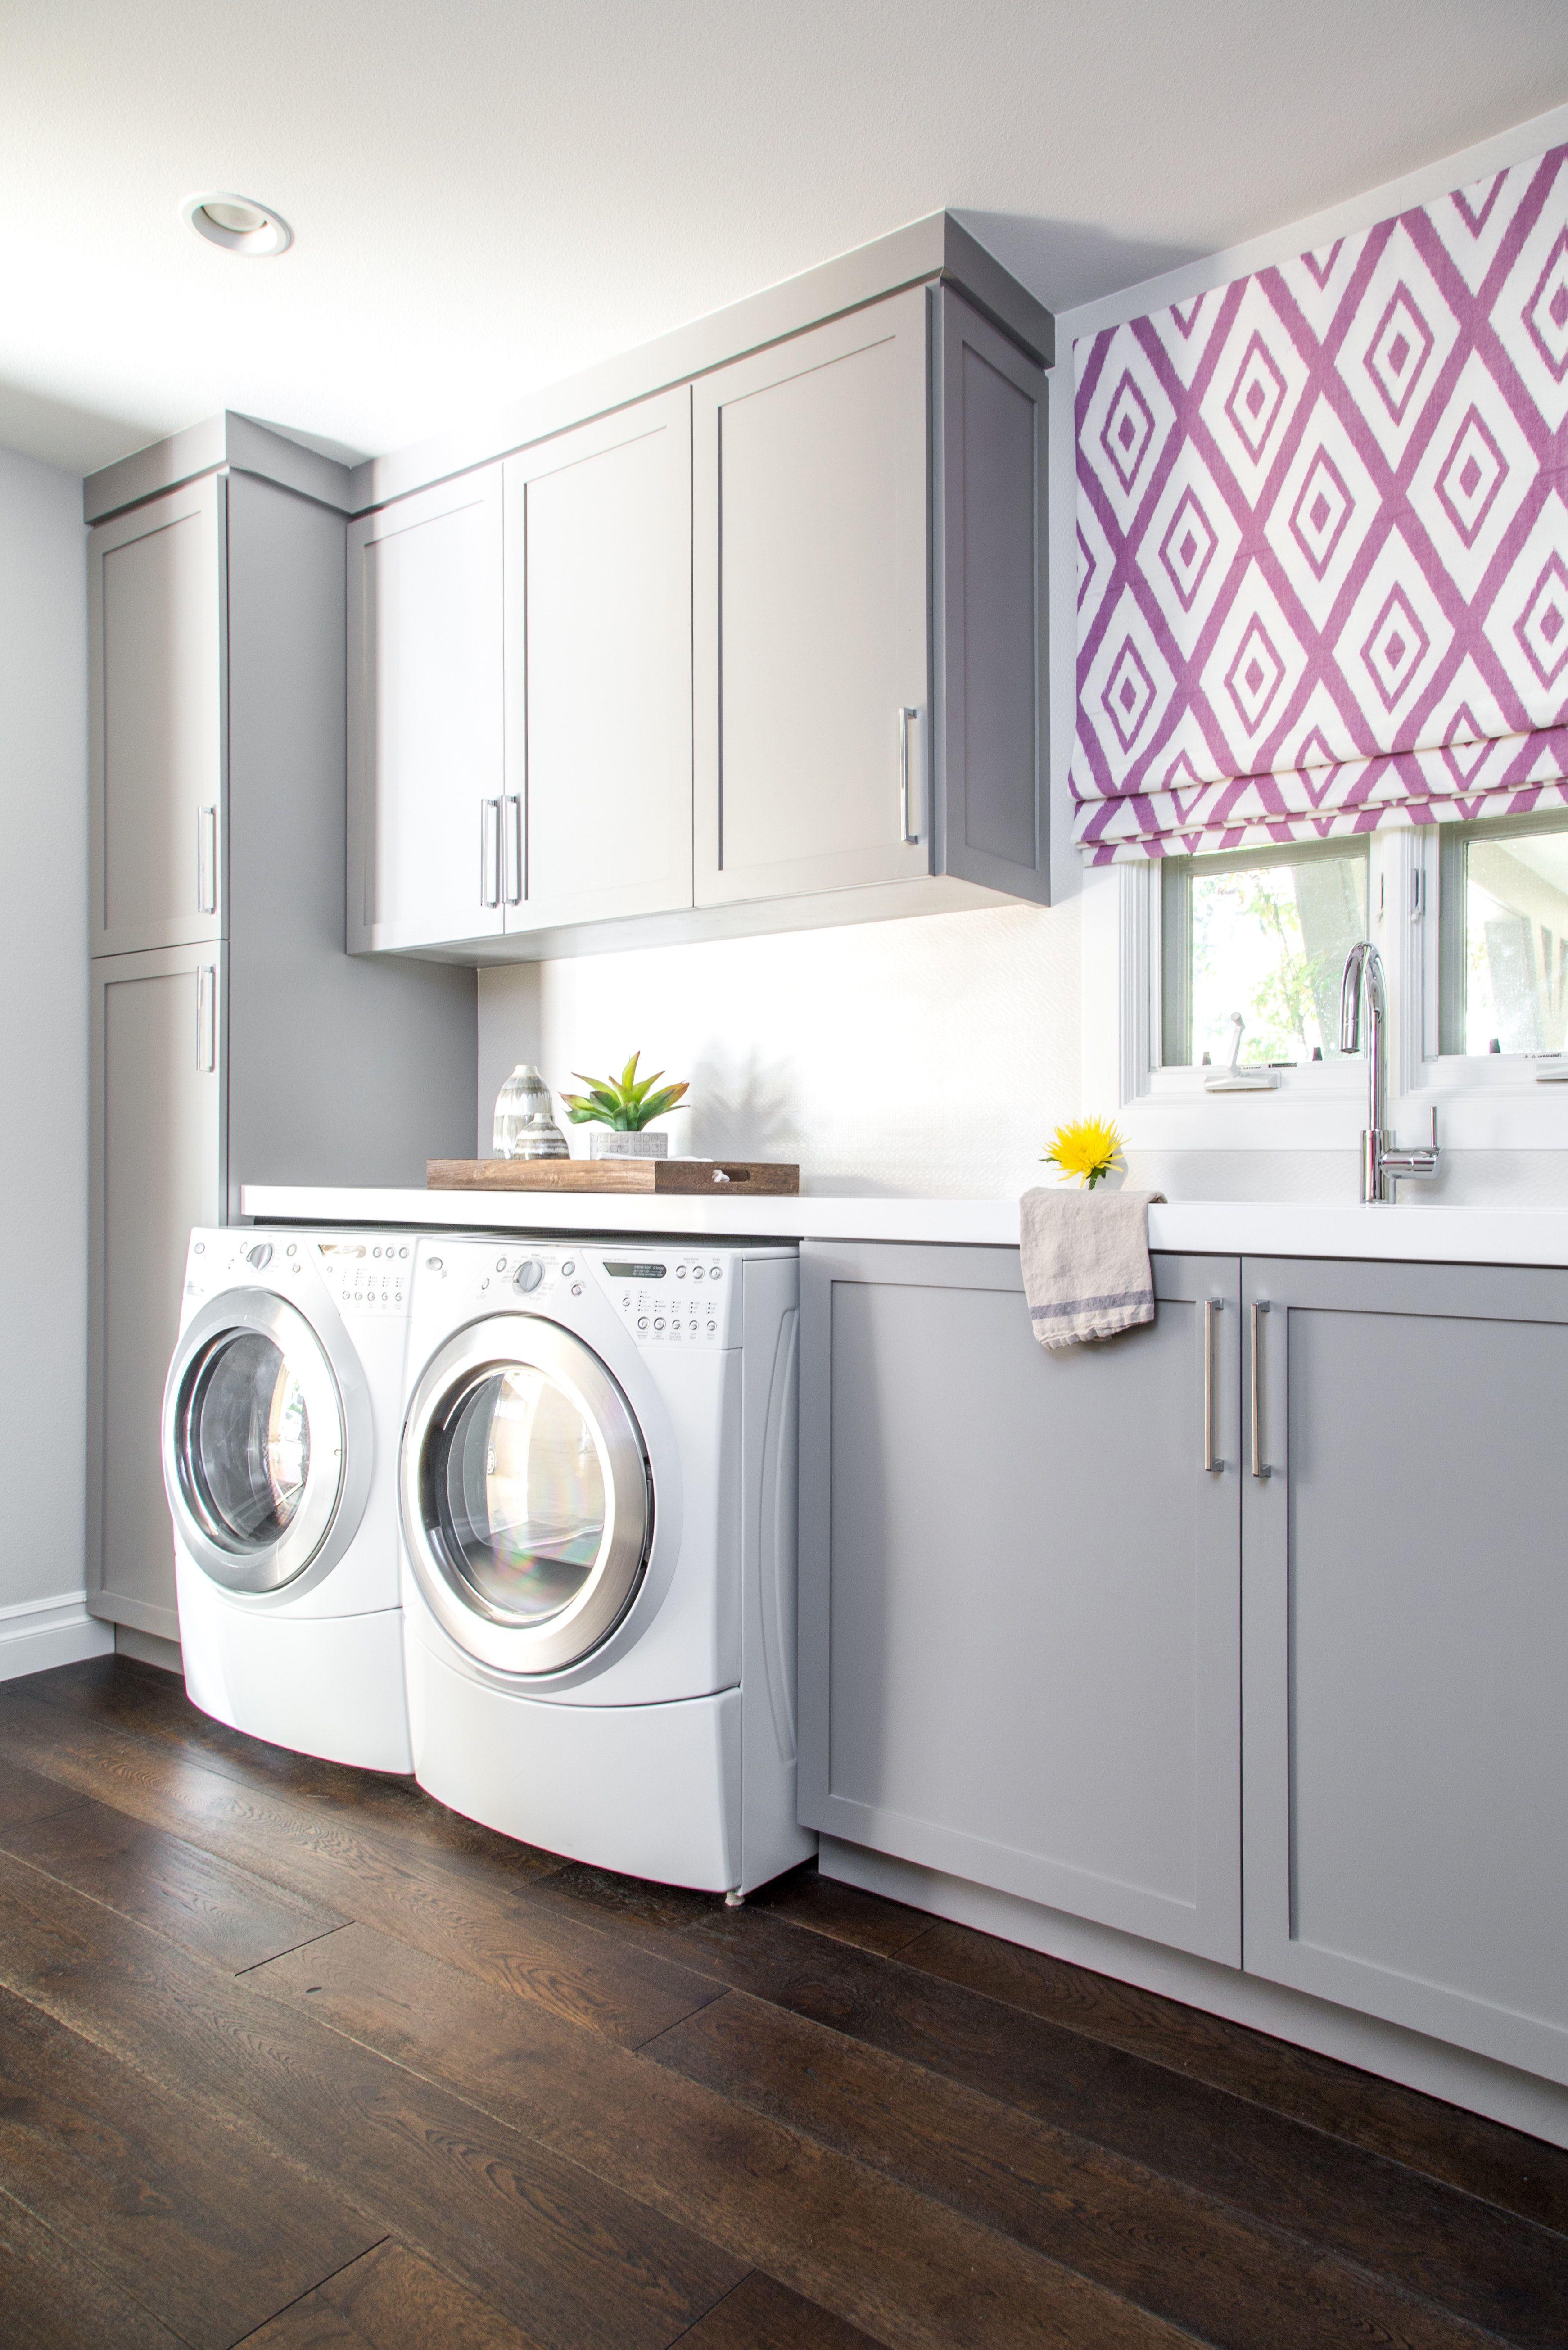 Laundry Room Light Grey Cabinetry Diamond Fabric Roman Shade Quartz Bathroom Freestanding Laundry Room Inspiration Home